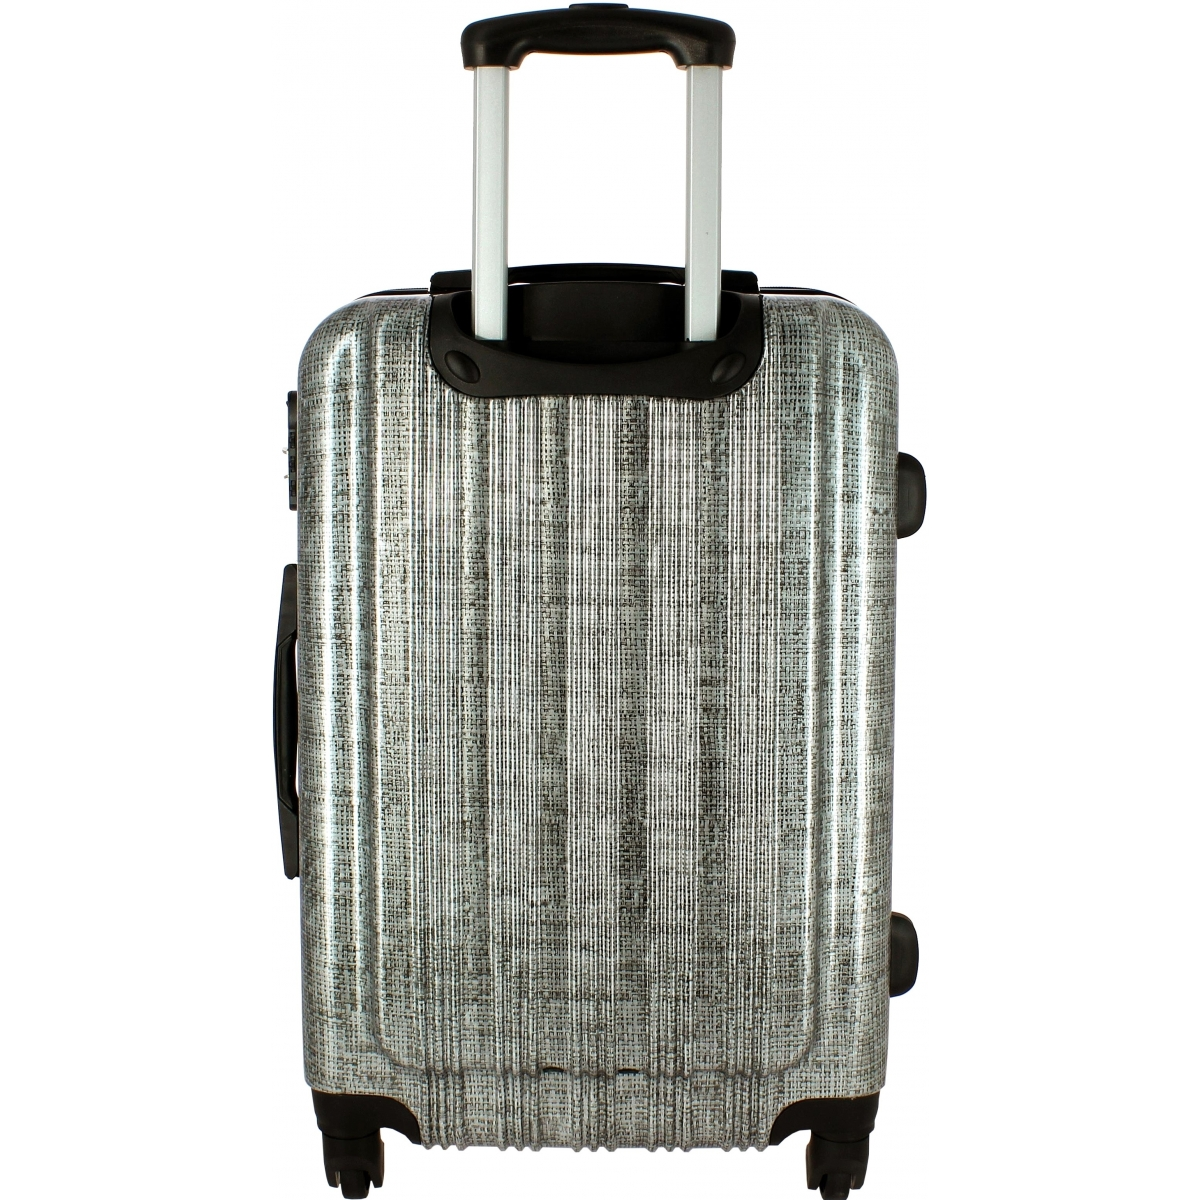 valise rigide abs david jones 65 cm ba20641m couleur. Black Bedroom Furniture Sets. Home Design Ideas